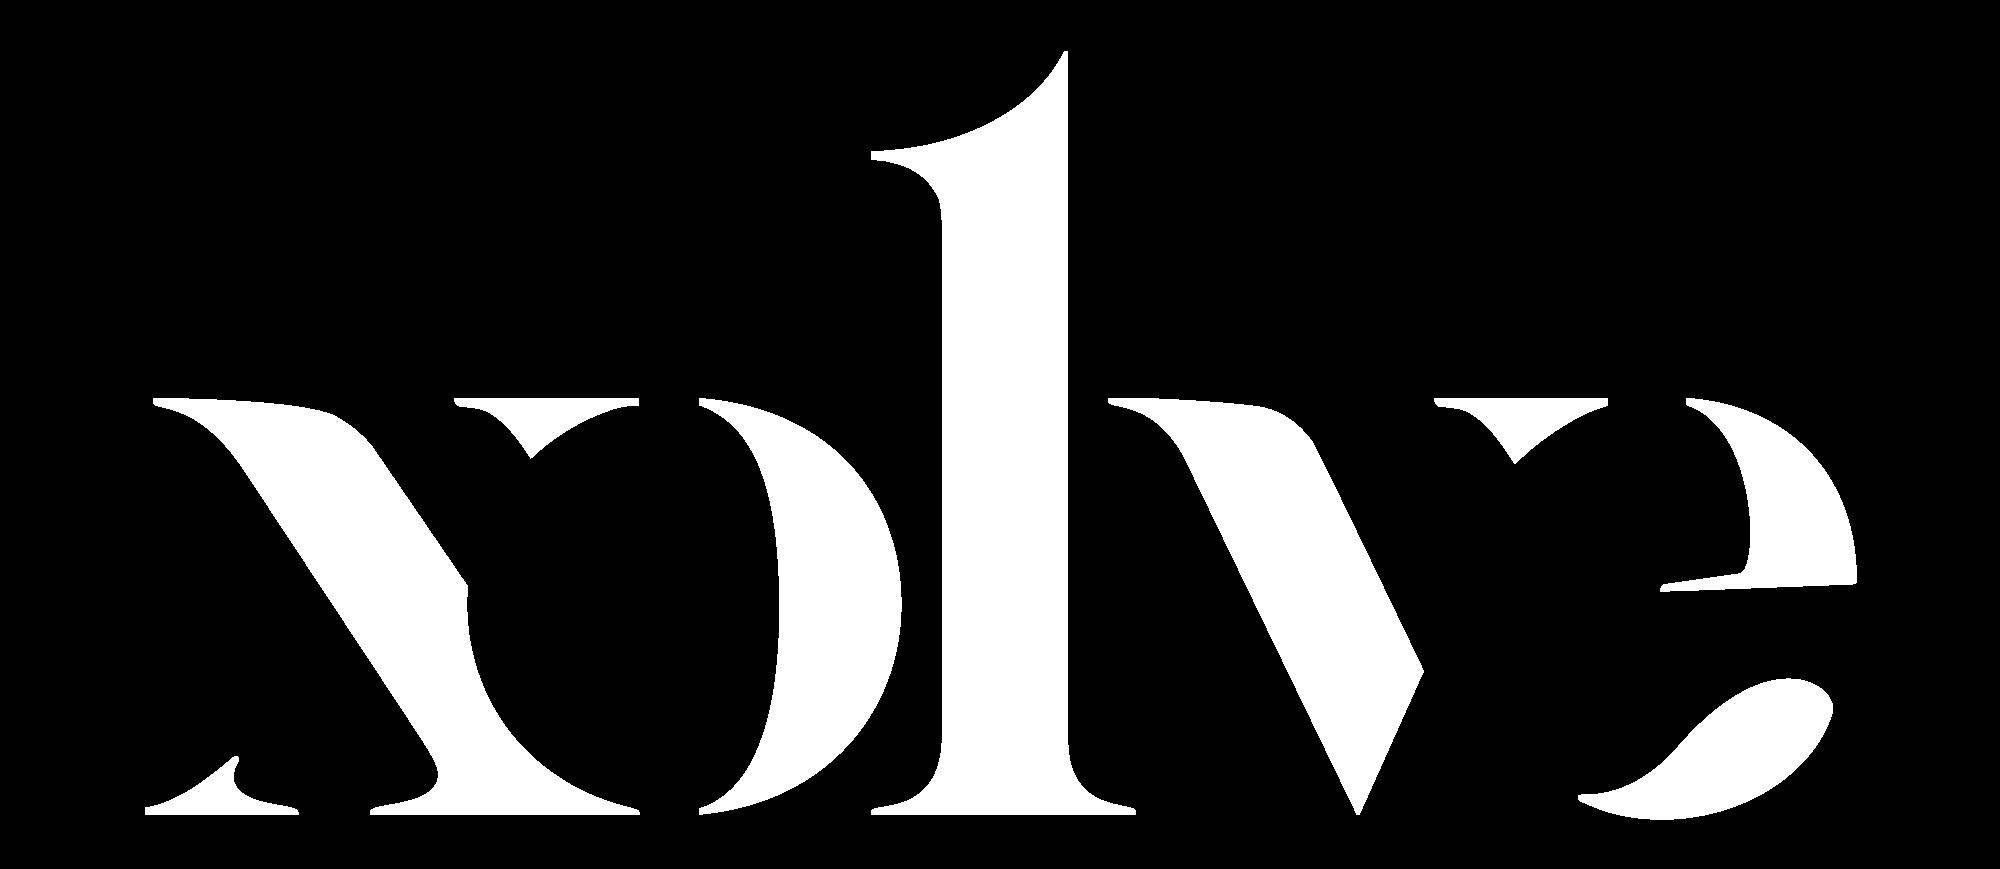 xolve branding creative logo